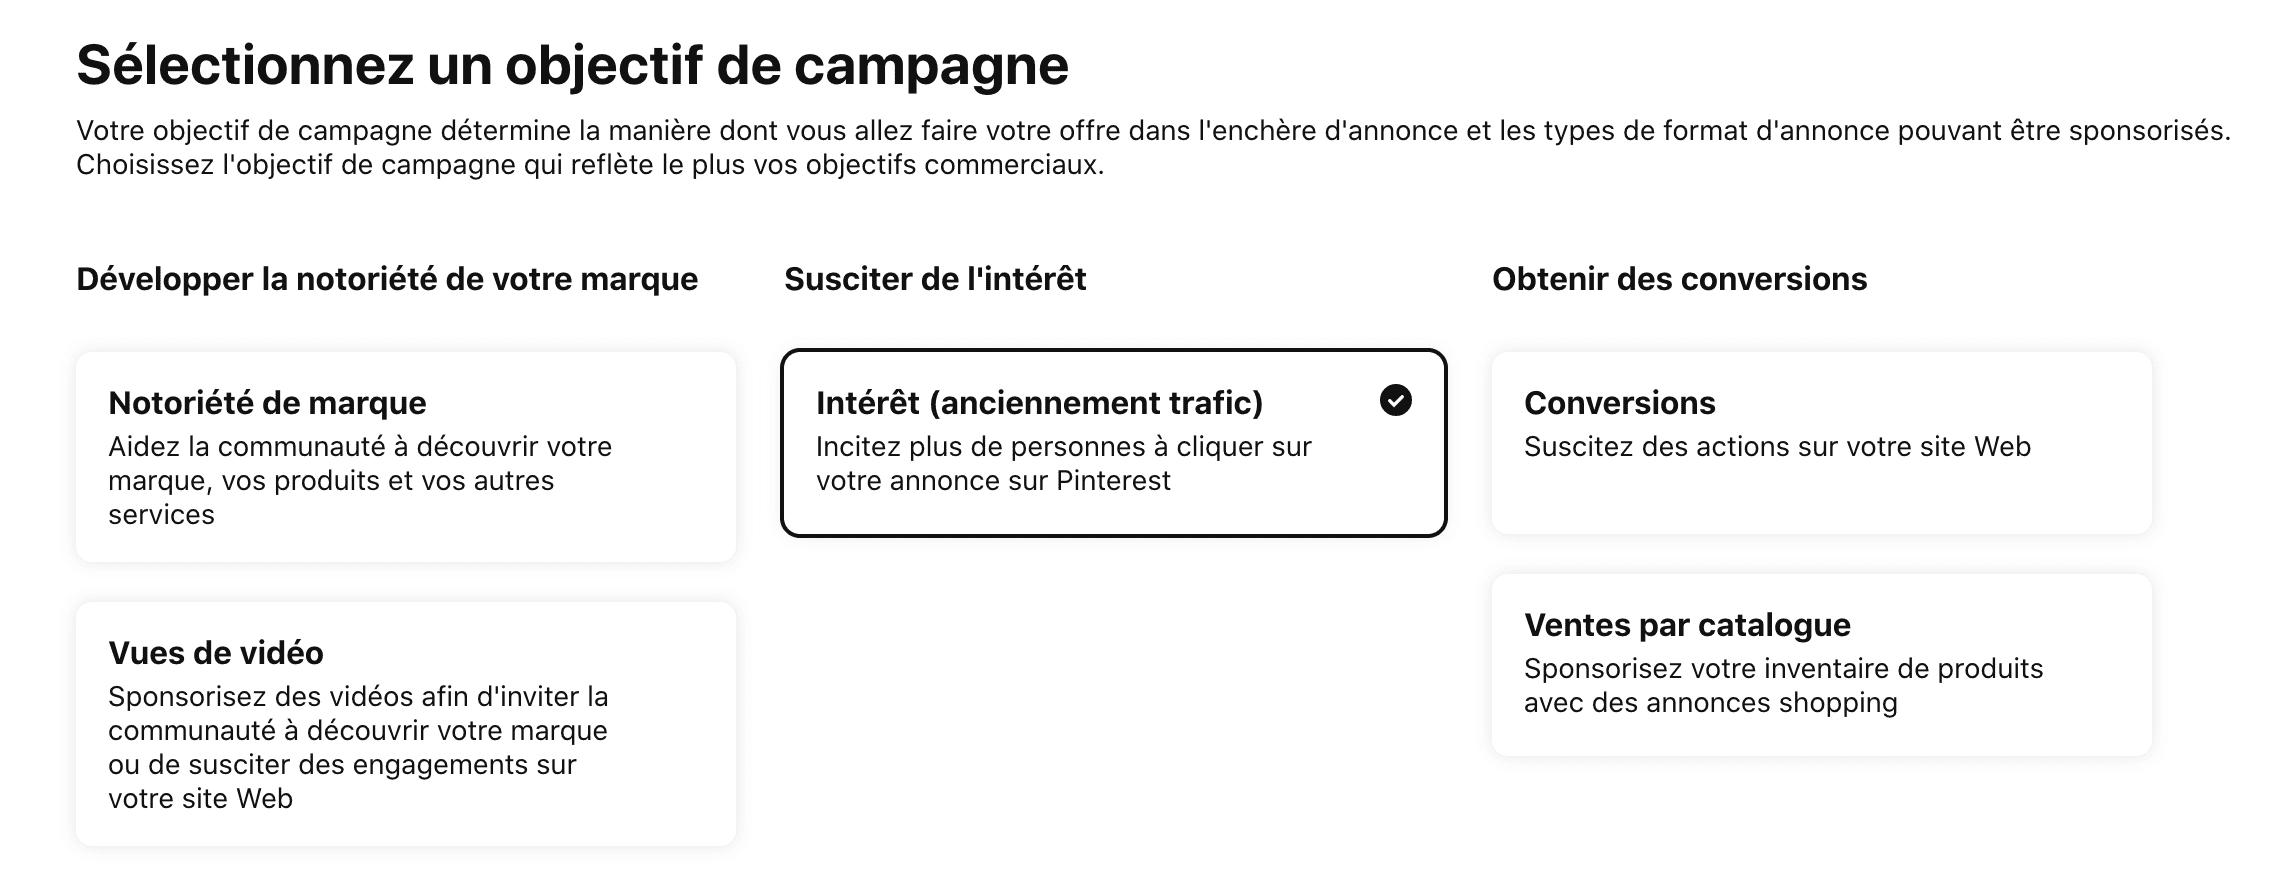 objectifs-campagne-pinterest-ads